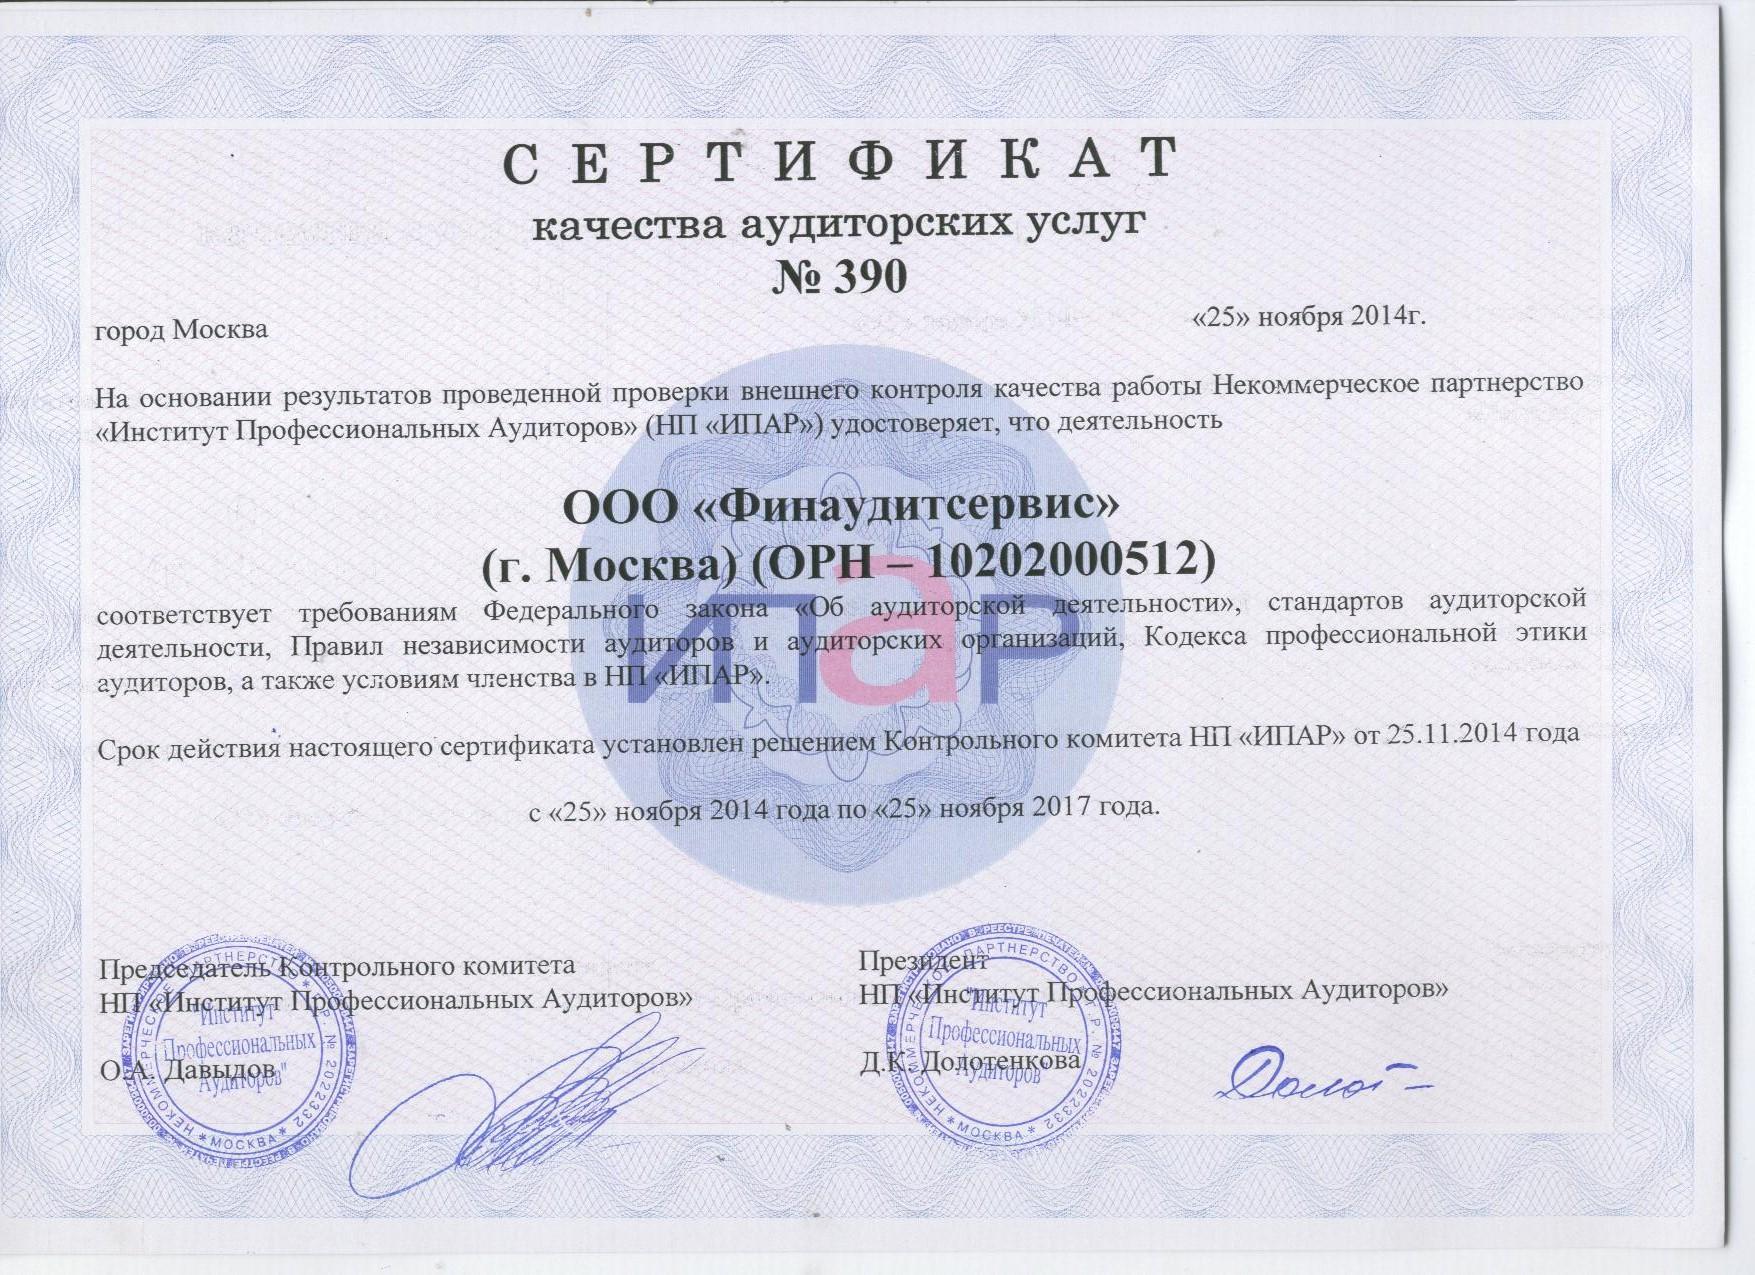 Сертификат ООО Финаудитсервис